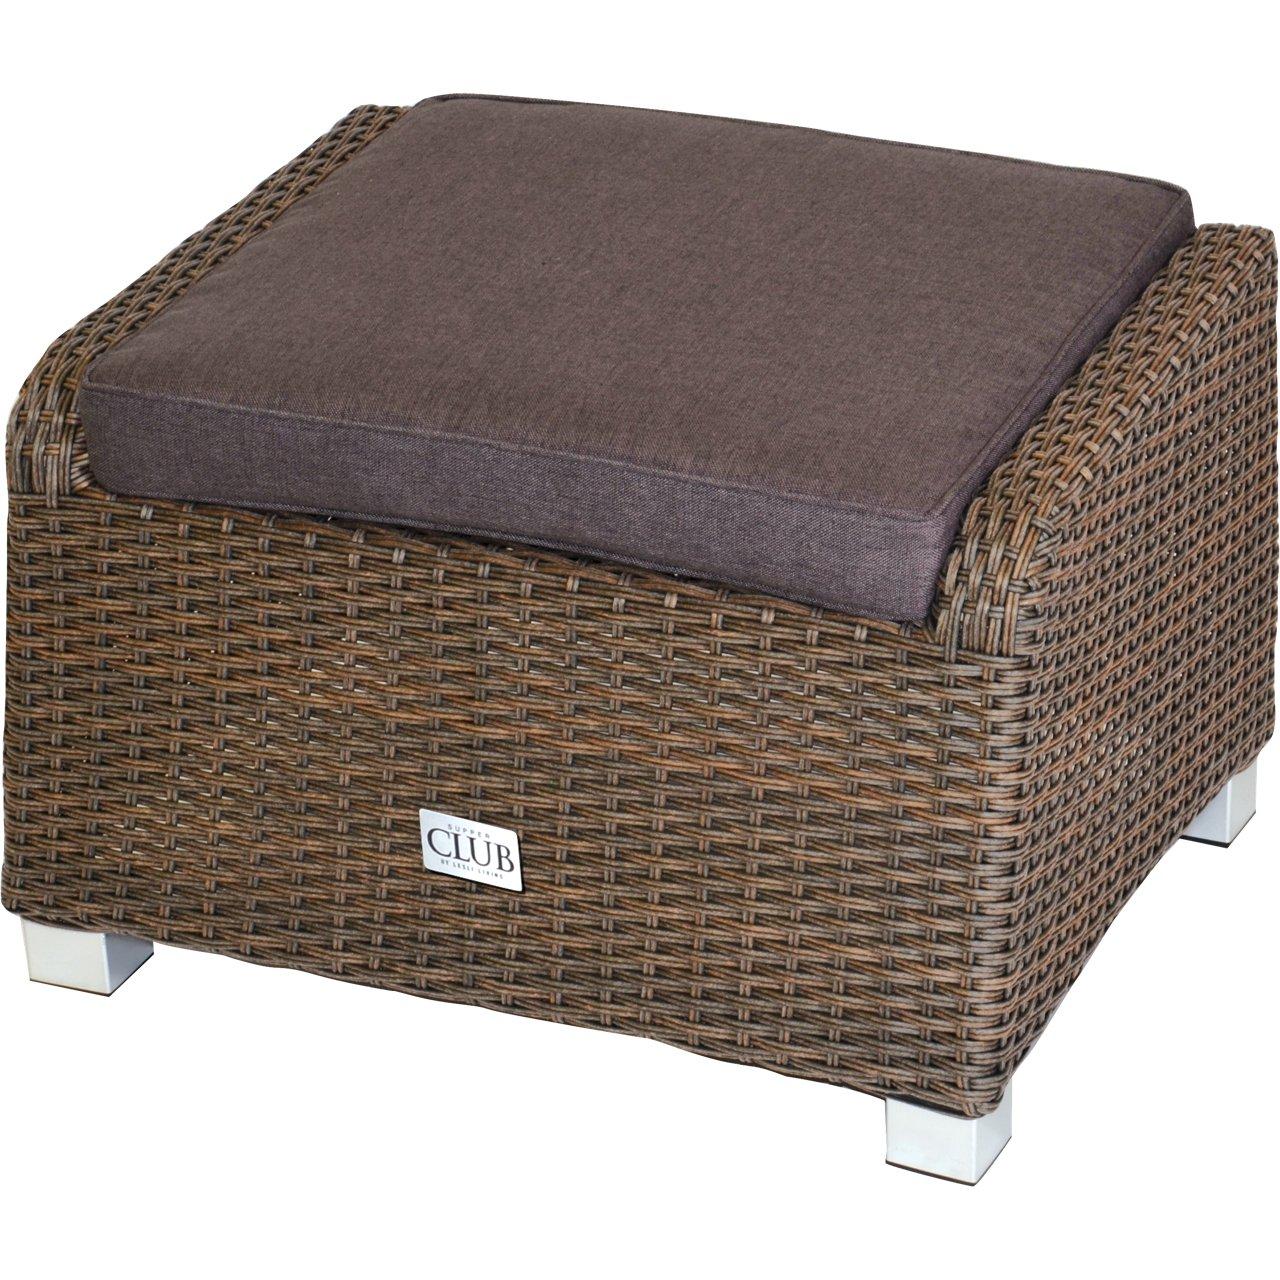 Foot Stool Woven Lounge Soho, Doppelrund Brown 71X56X45CM Lesli Living